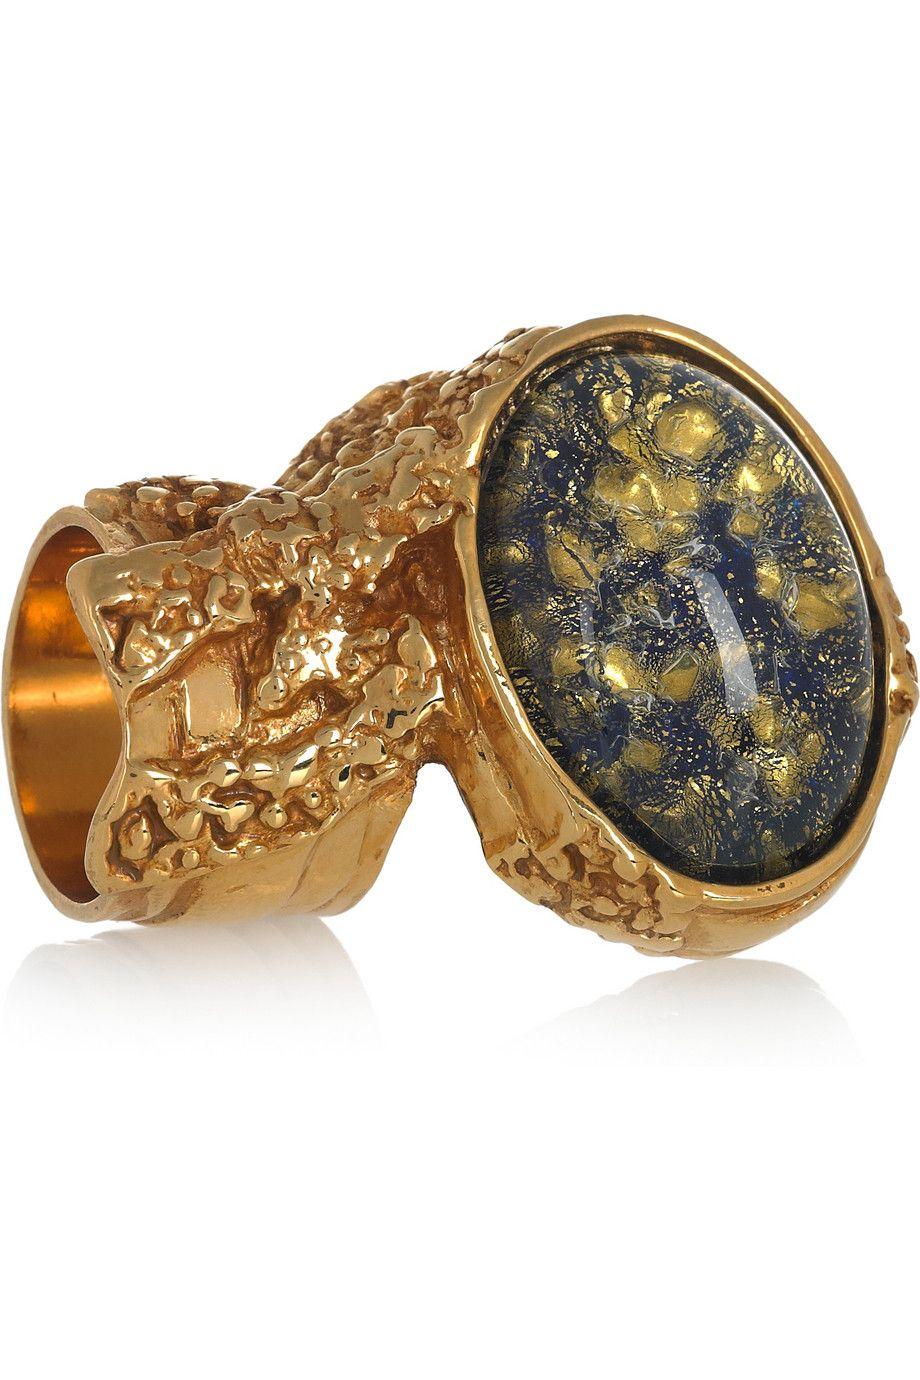 Yves Saint Laurent Arty gold-plated glass ring NET-A-PORTER.COM $290